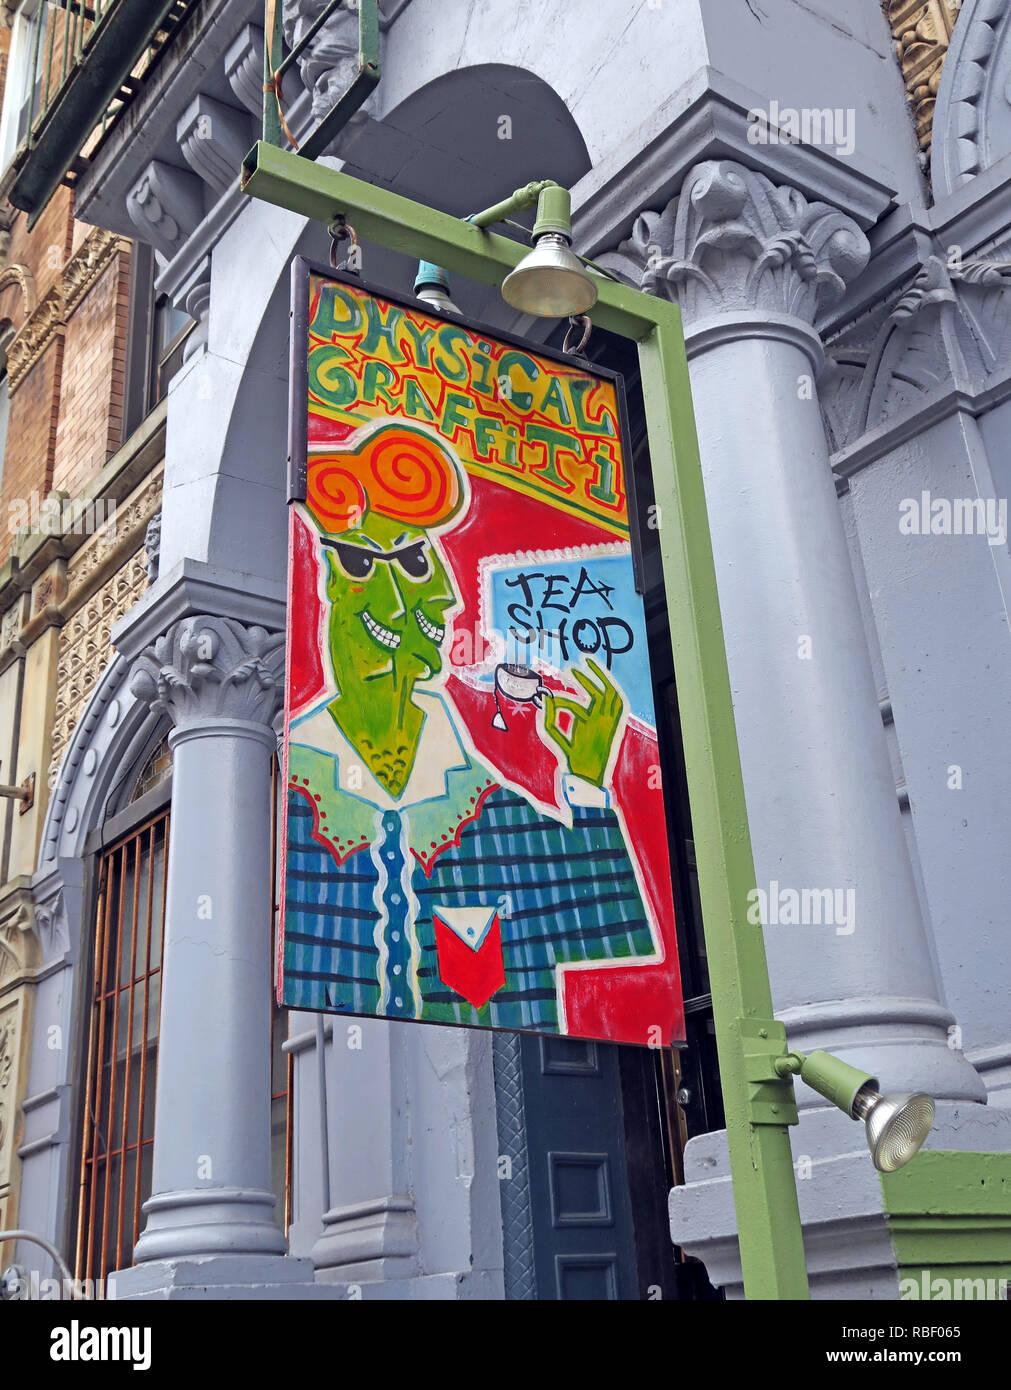 GoTonySmith,@HotpixUK,HotpixUK,NOHO NYC,NYC,New York City,St Marks Place,St Marks Place NYC,street,New York Street,USA,America,City Centre,city,centre,center,city center,New York Travel Tourism,shop,cafe,poster,front,shopfront